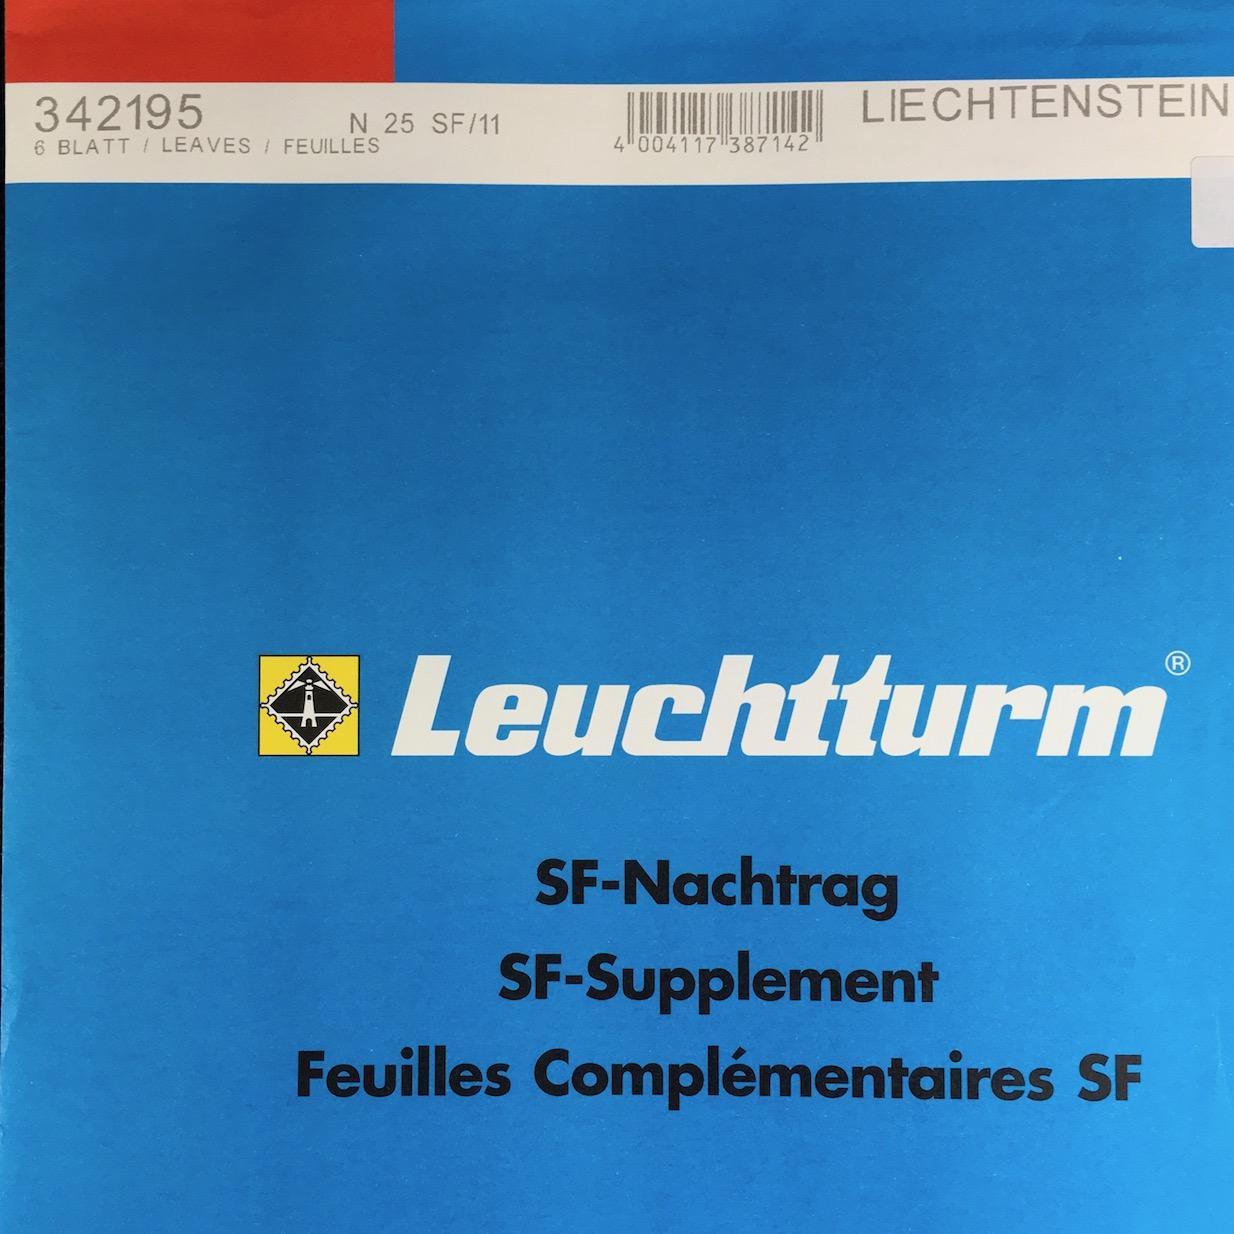 Leuchtturm SF-Nachtrag Schweiz 2019